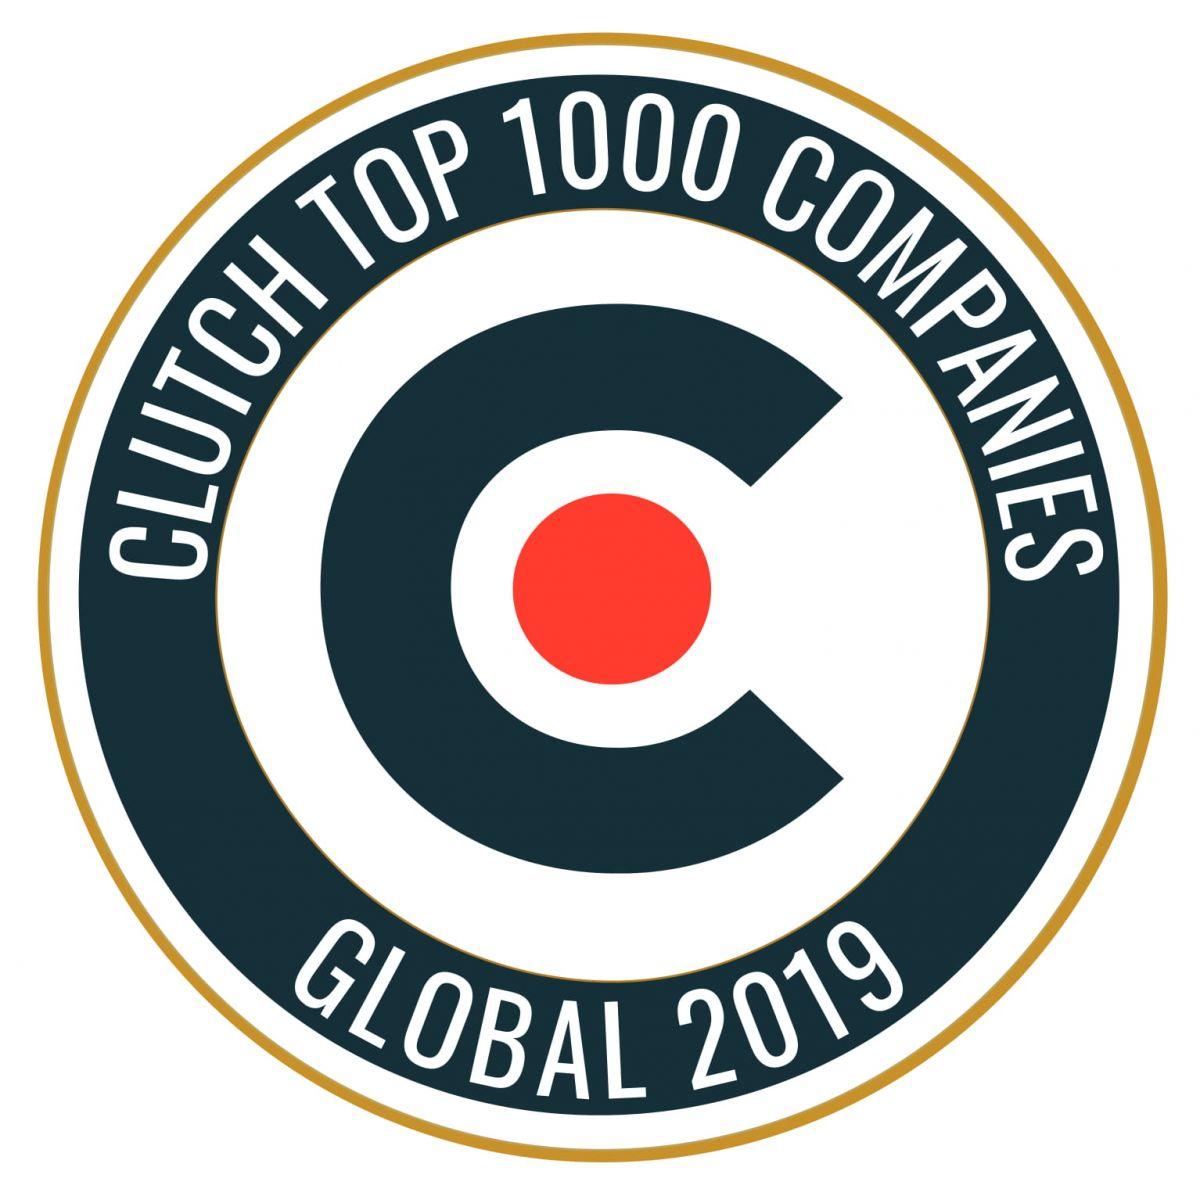 clutch top 100 companies logo